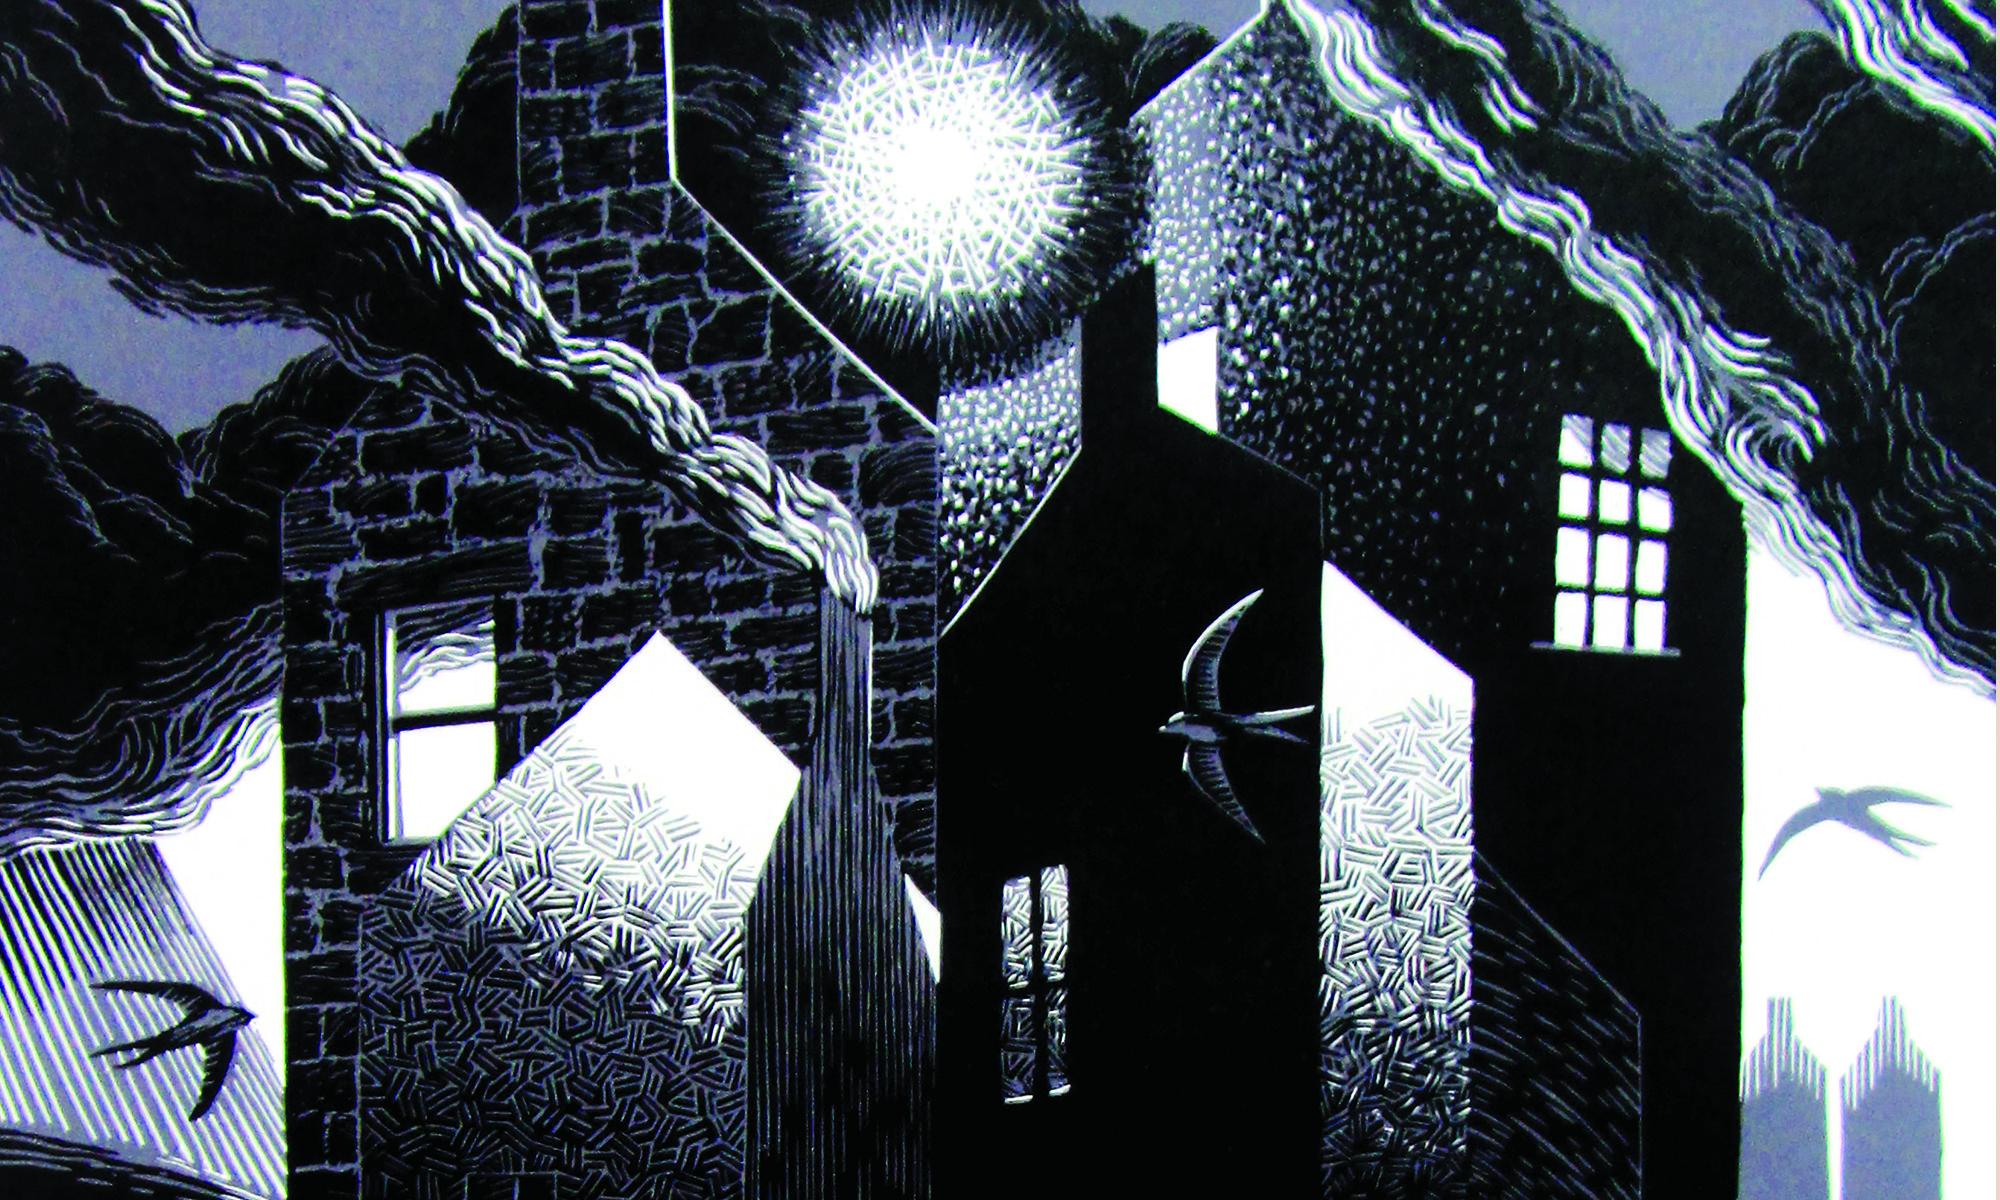 Dundas Street Gallery, Bryan Angus, Carved Light